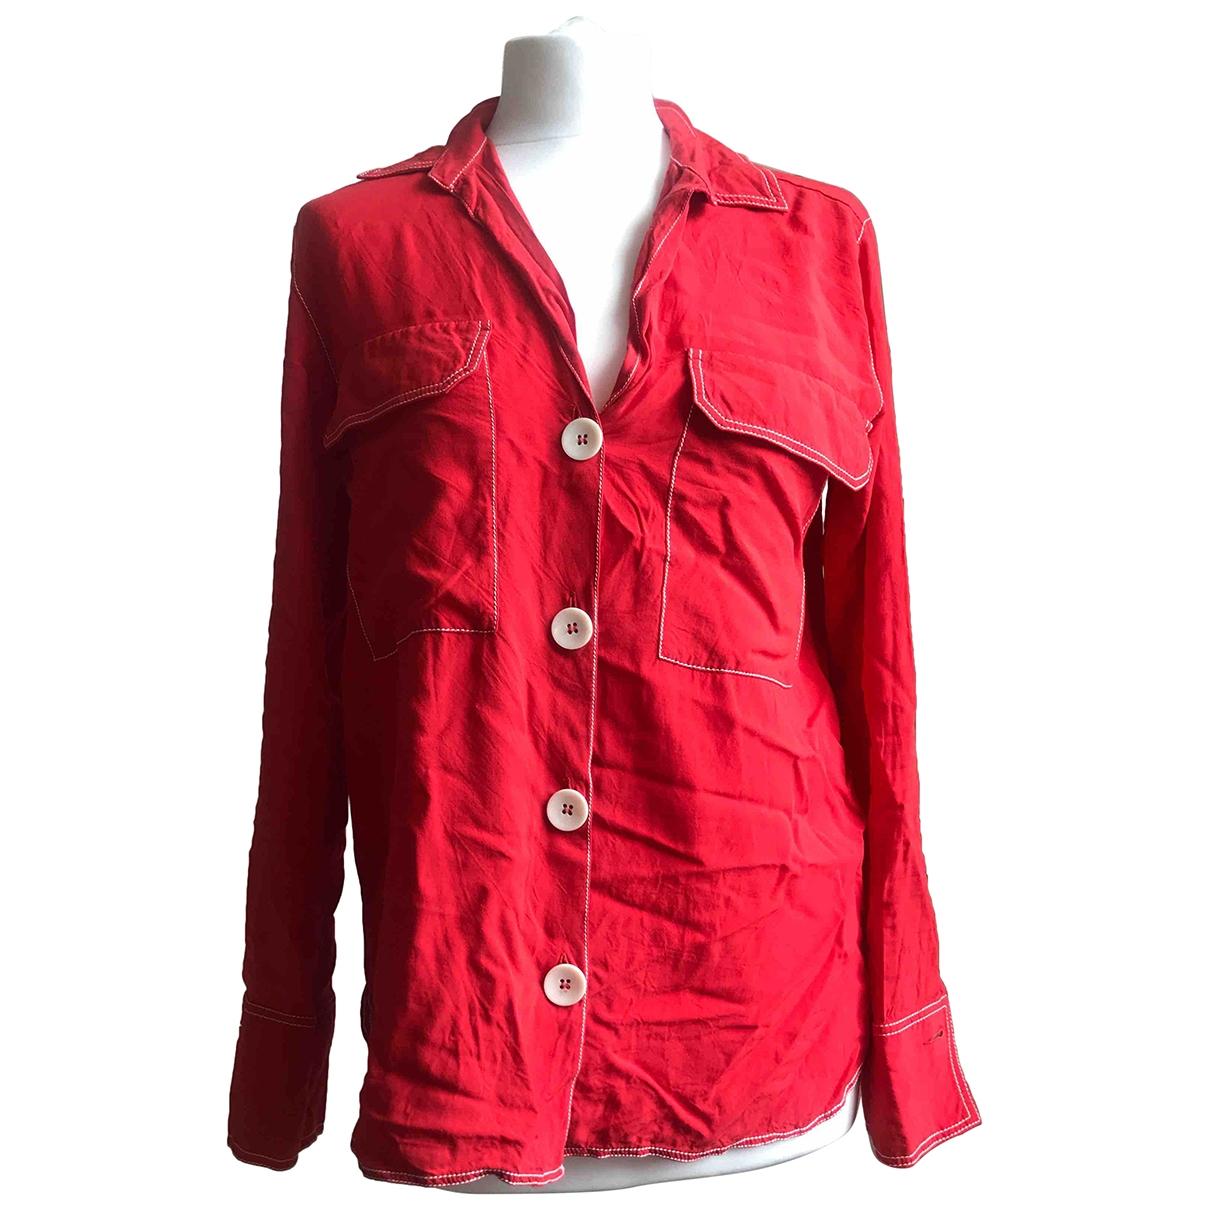 Zara \N Red  top for Women S International